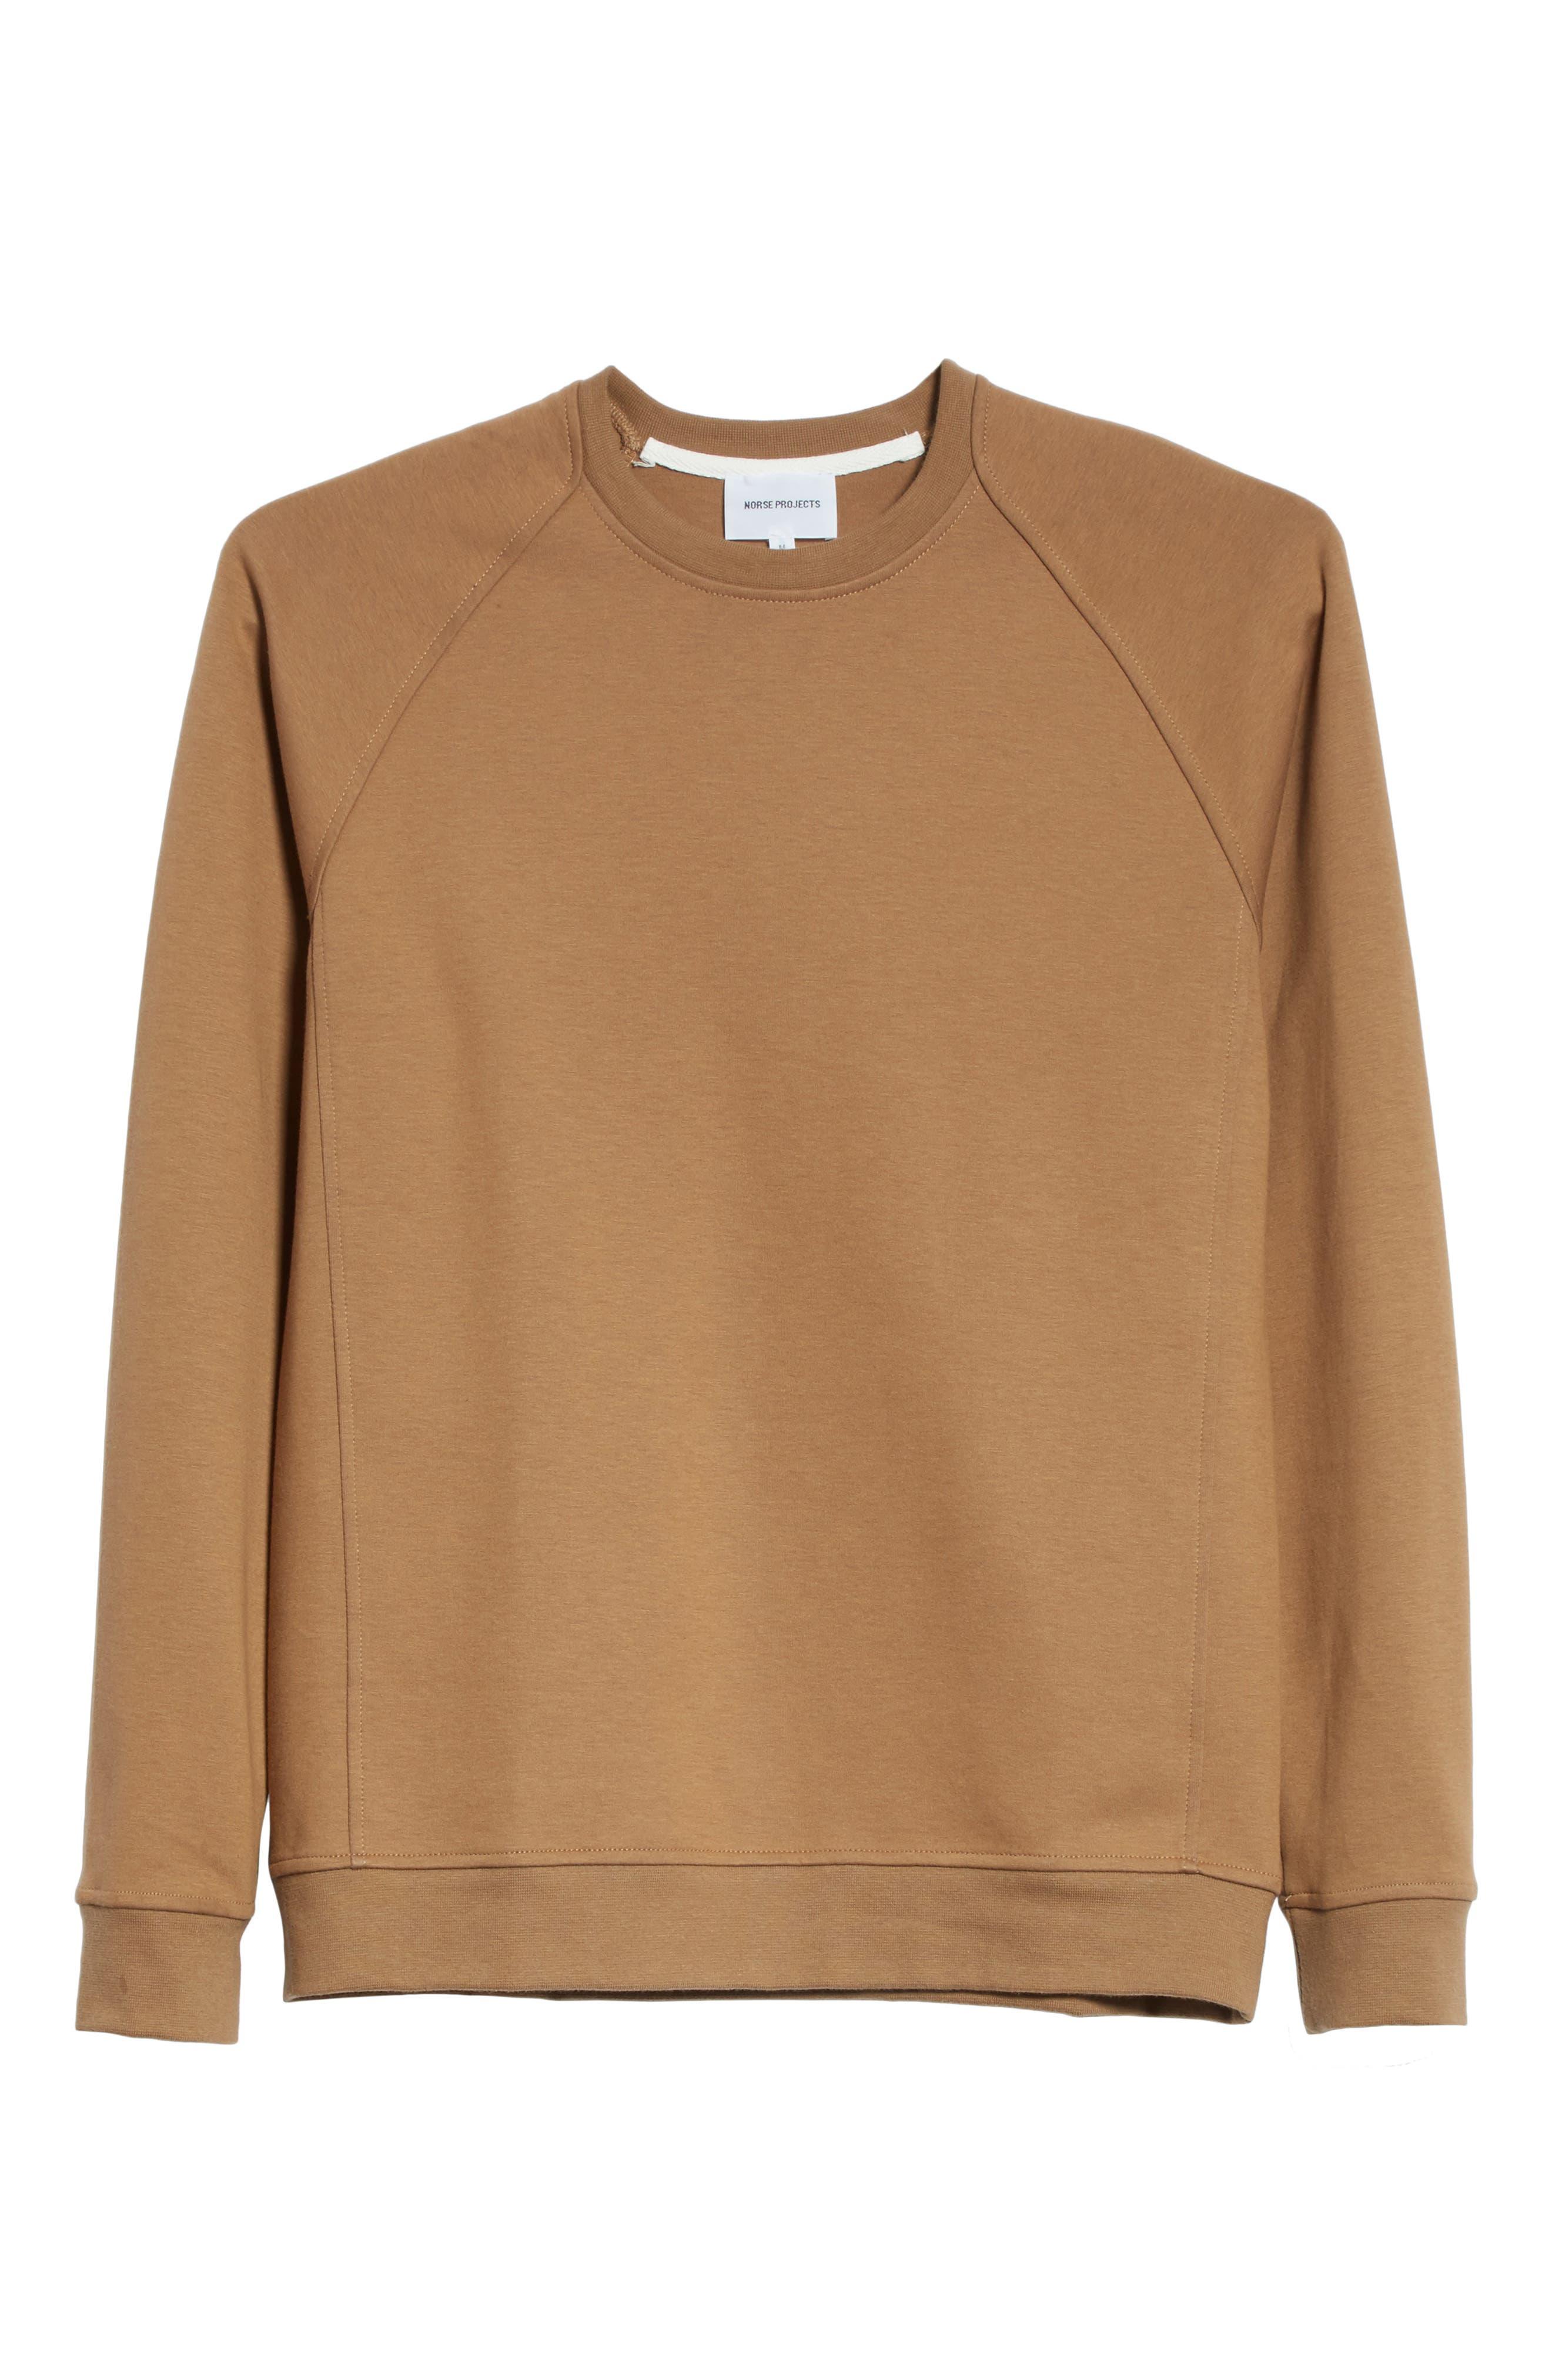 Ketel Dry Mercerized Crewneck Sweatshirt,                             Alternate thumbnail 6, color,                             251